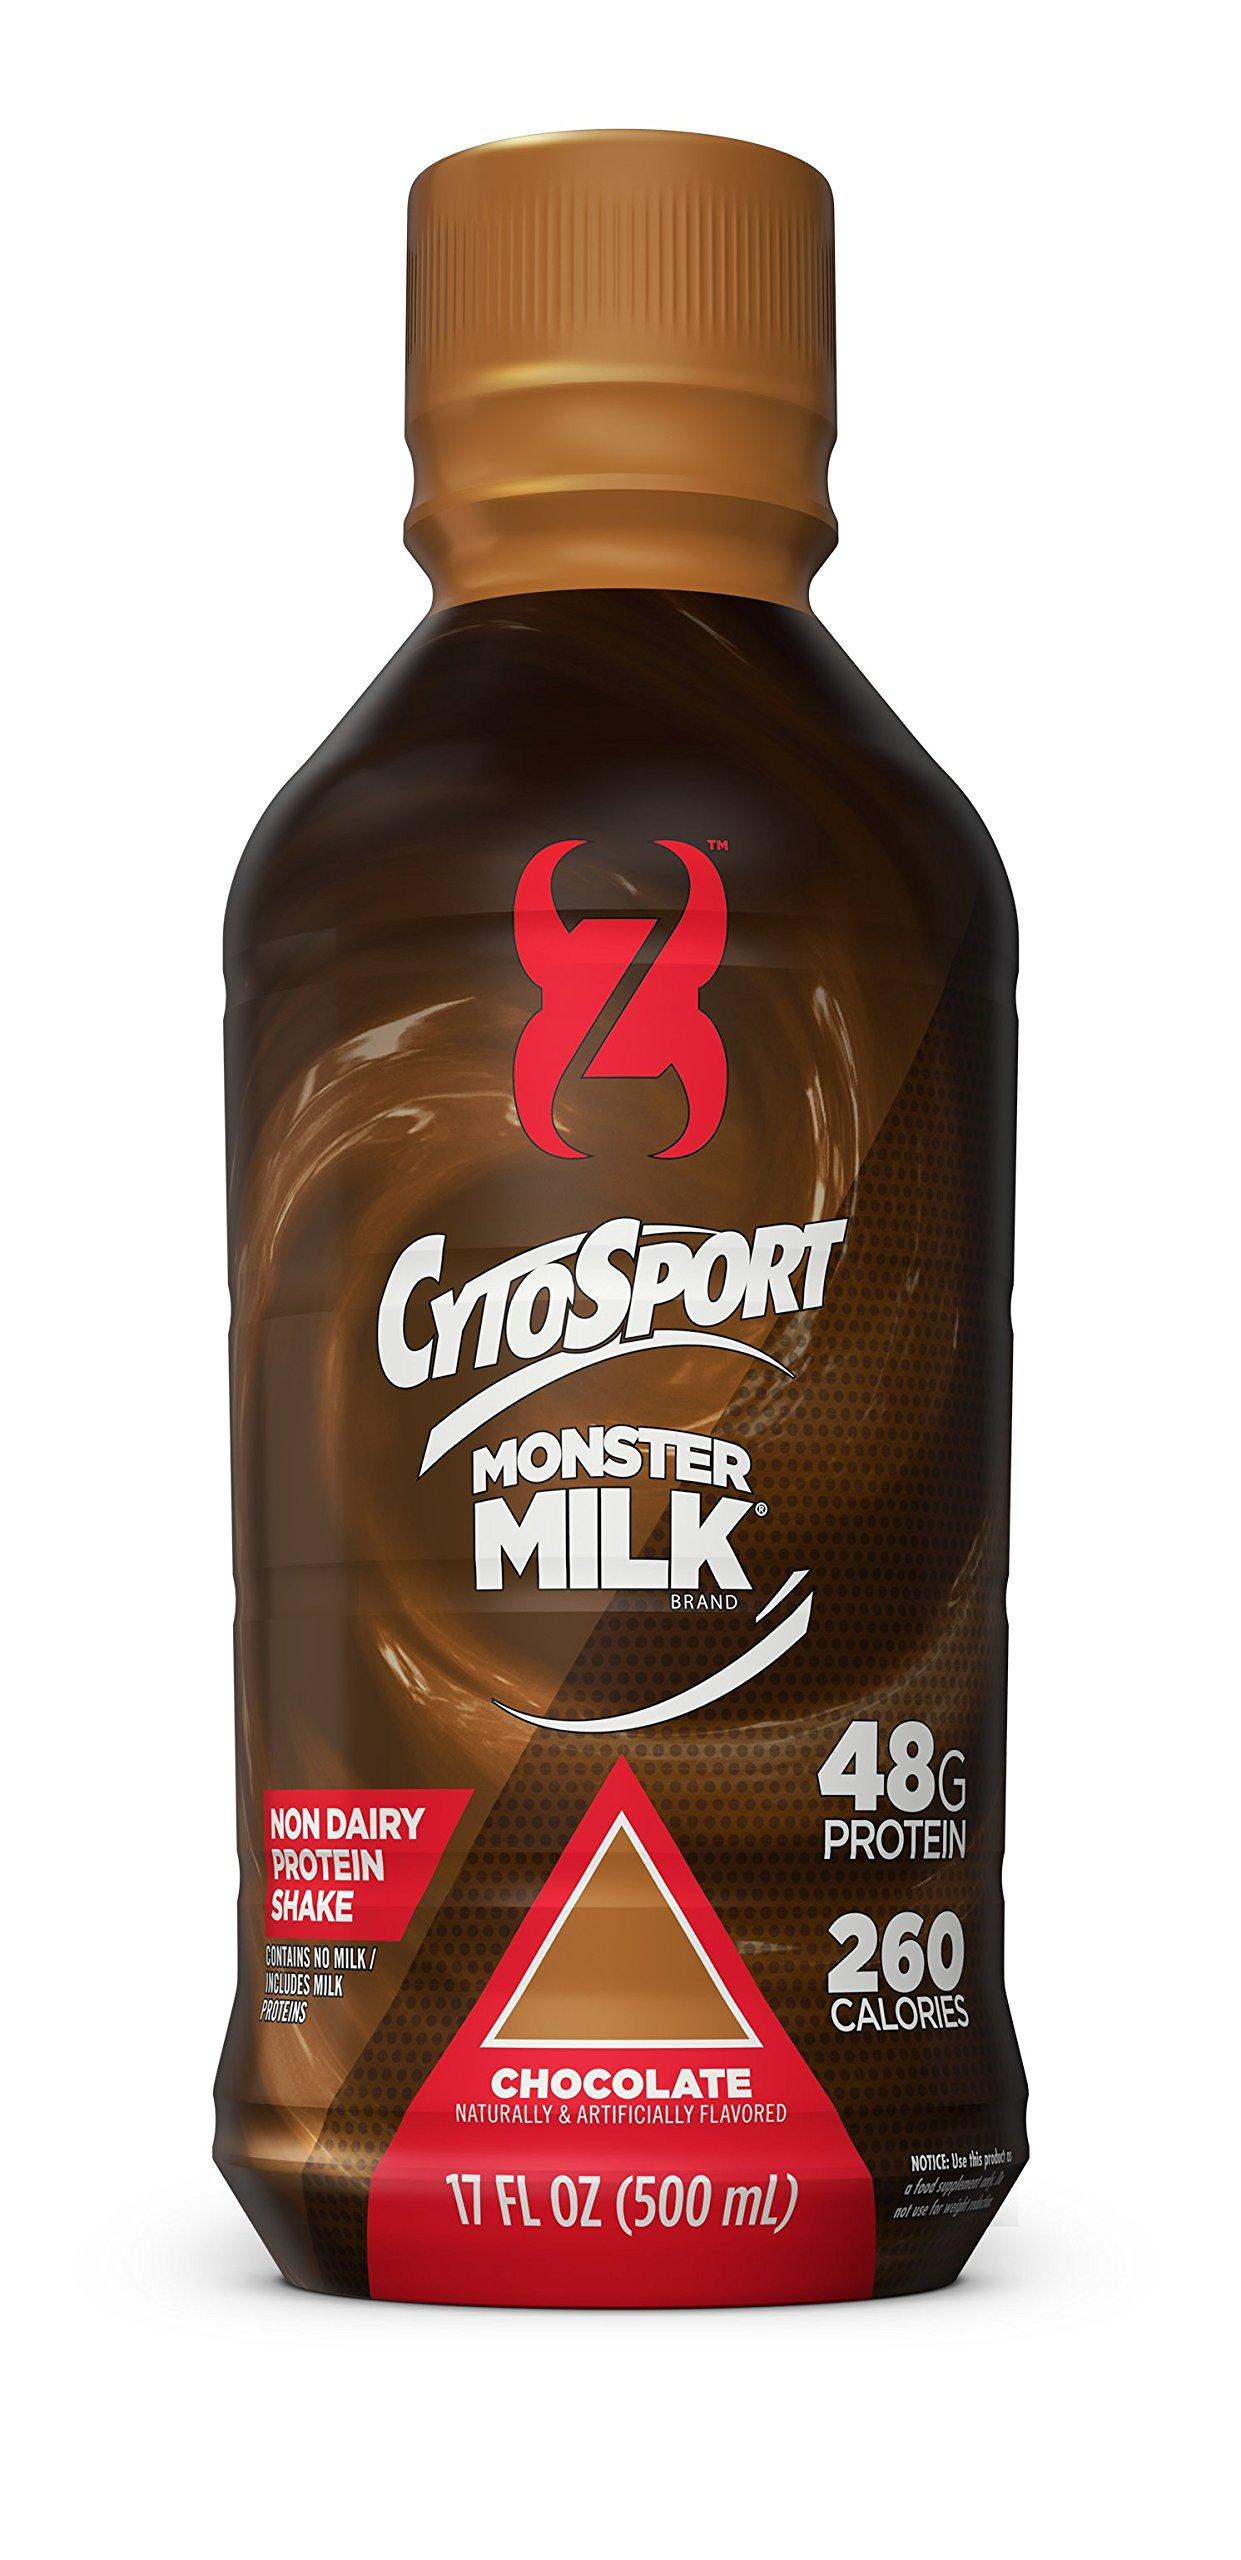 CytoSport Monster Milk Protein Shake, Chocolate, 48g Protein, 17 FL OZ, 12 Count by CytoSport